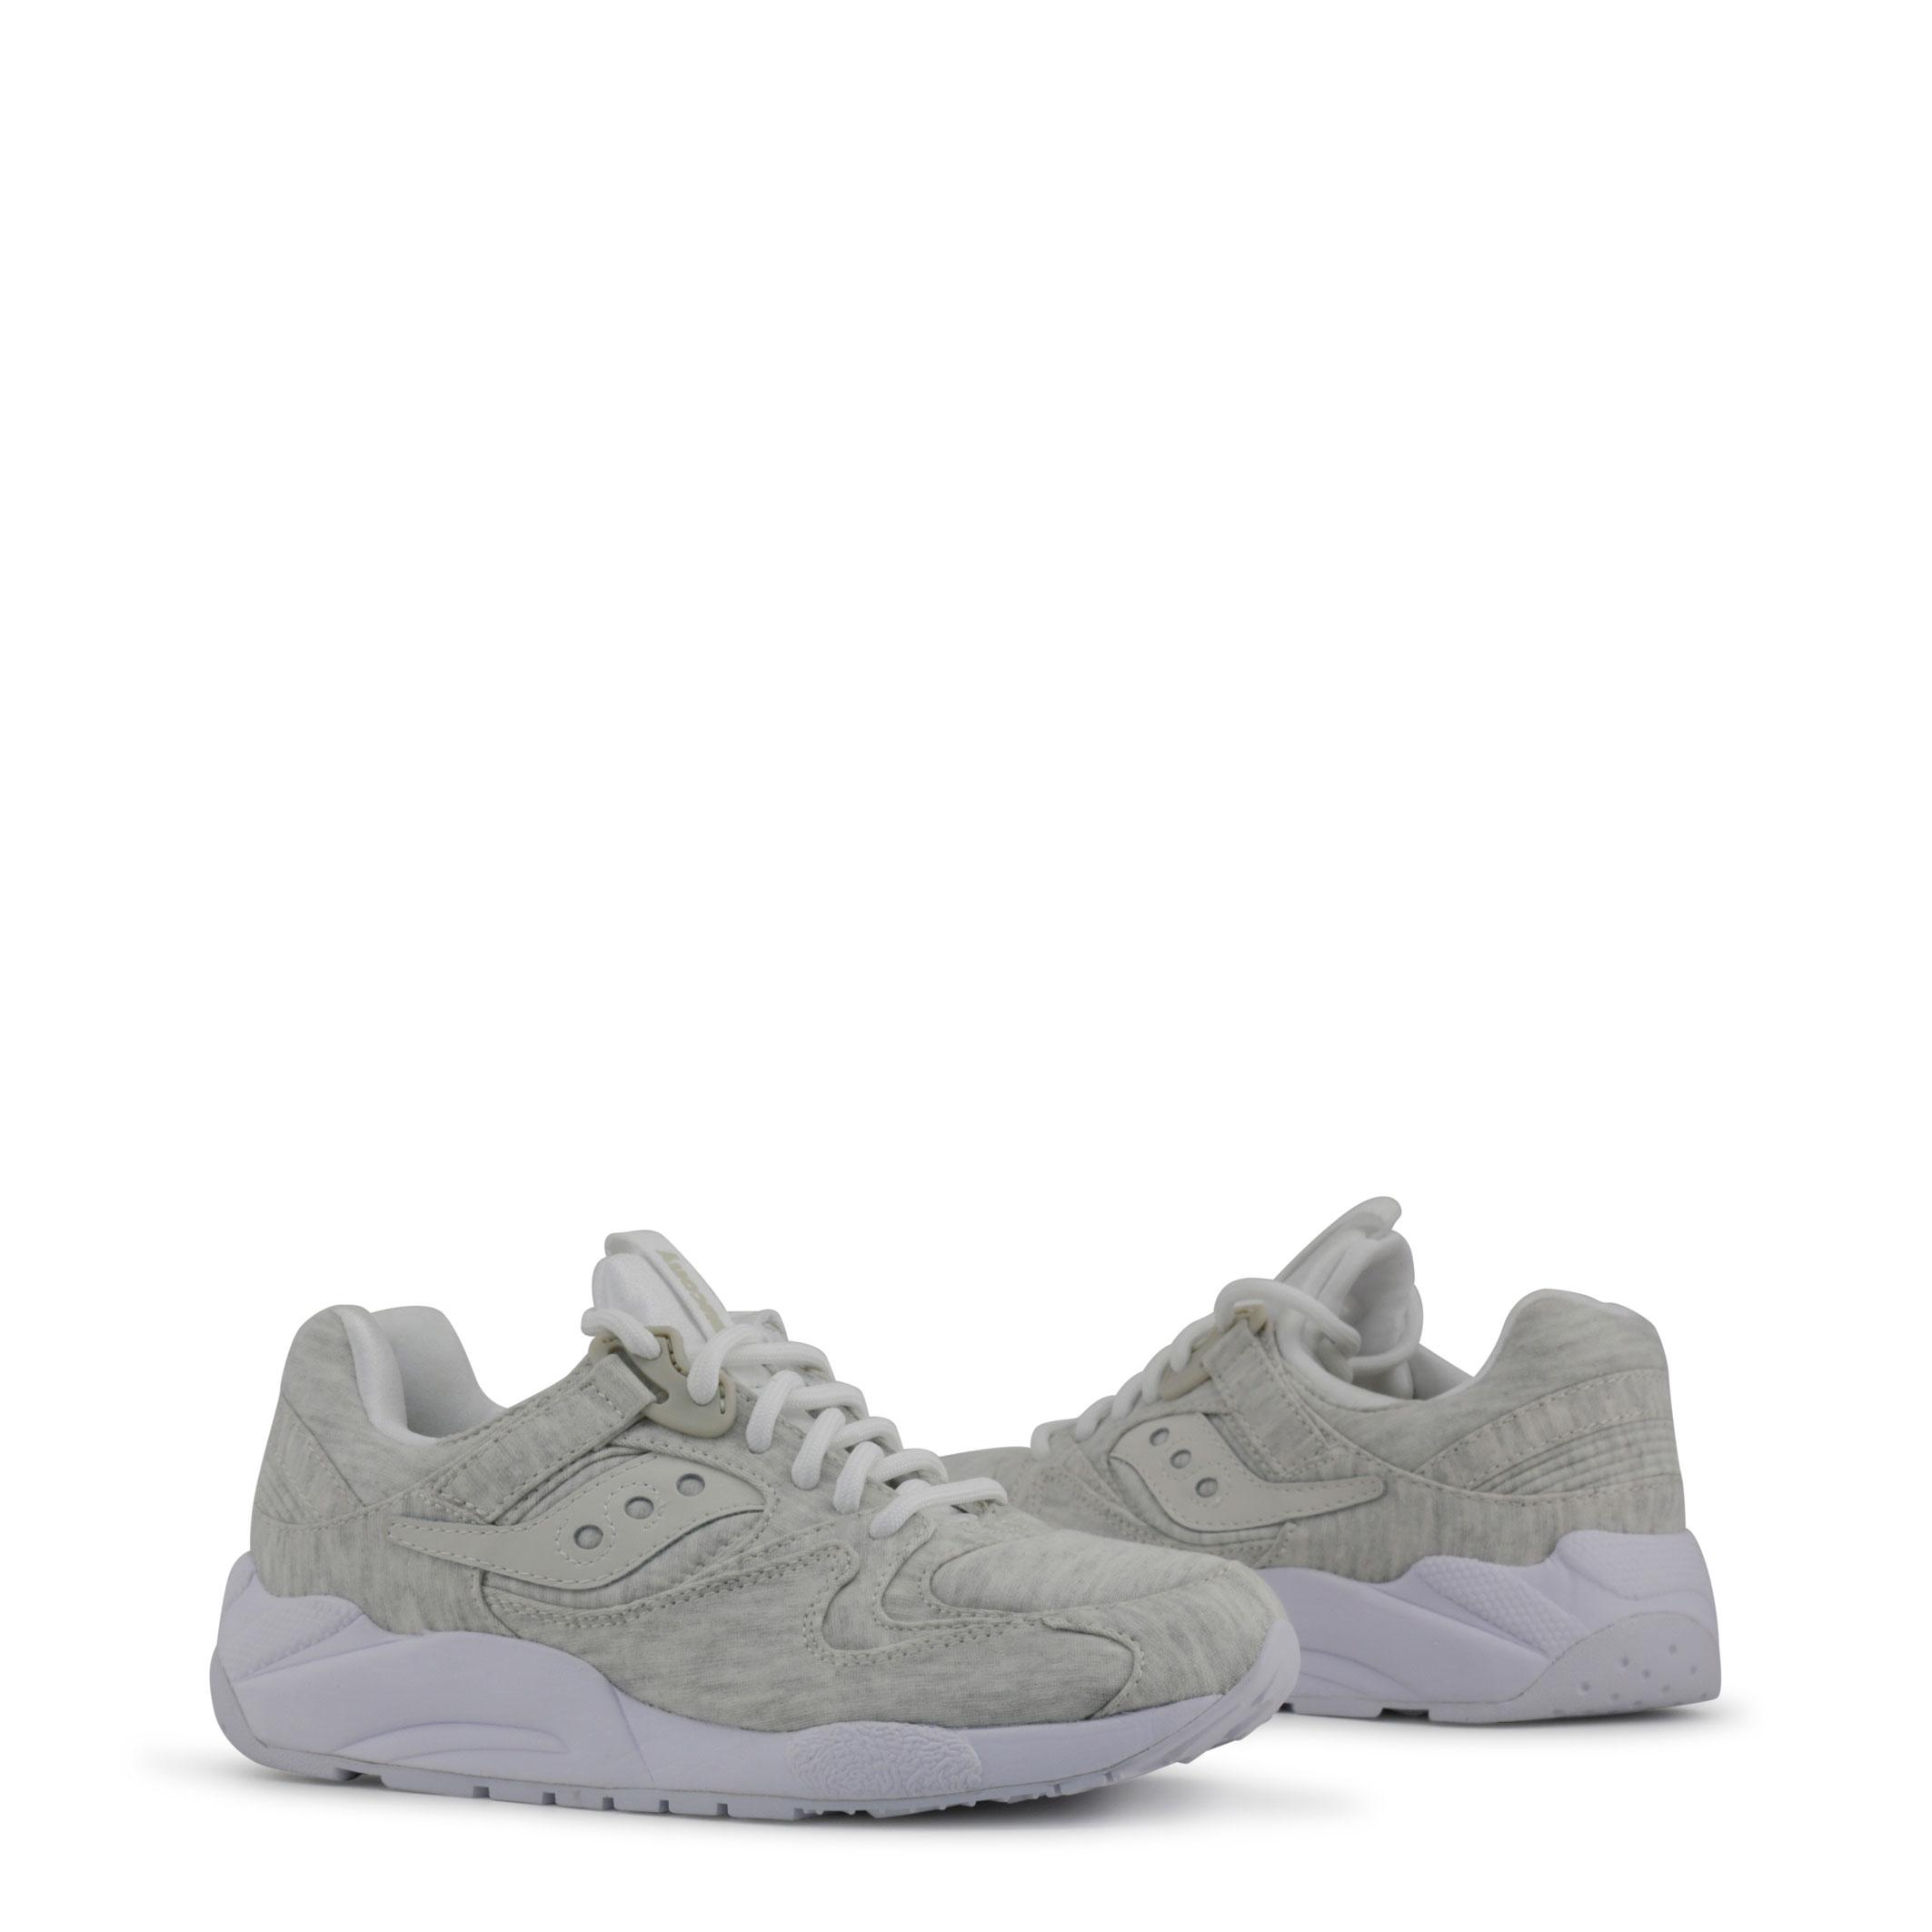 Sneakers-Saucony-GRID-9000-HT-S70348-Uomo-Bianco-92876 miniatura 3